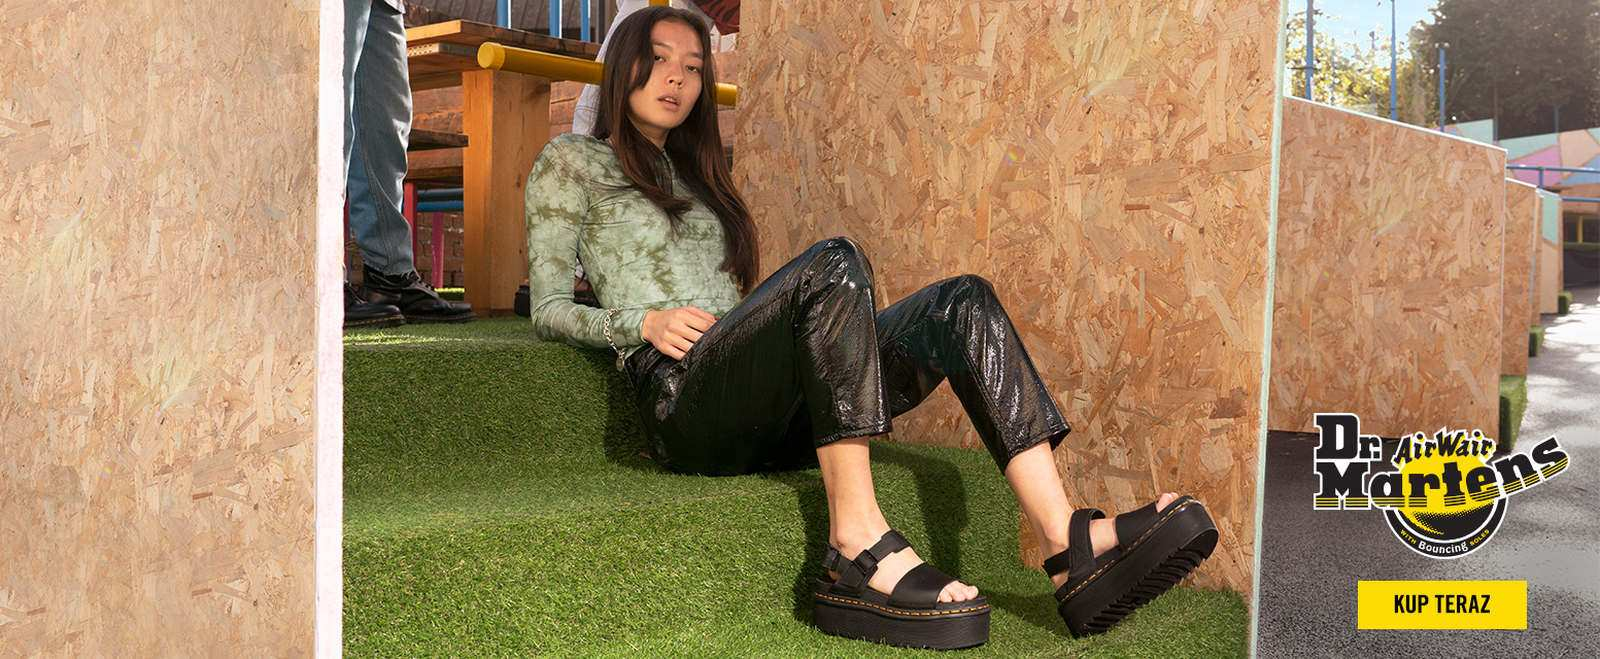 czarne sandaly damskie dr martens